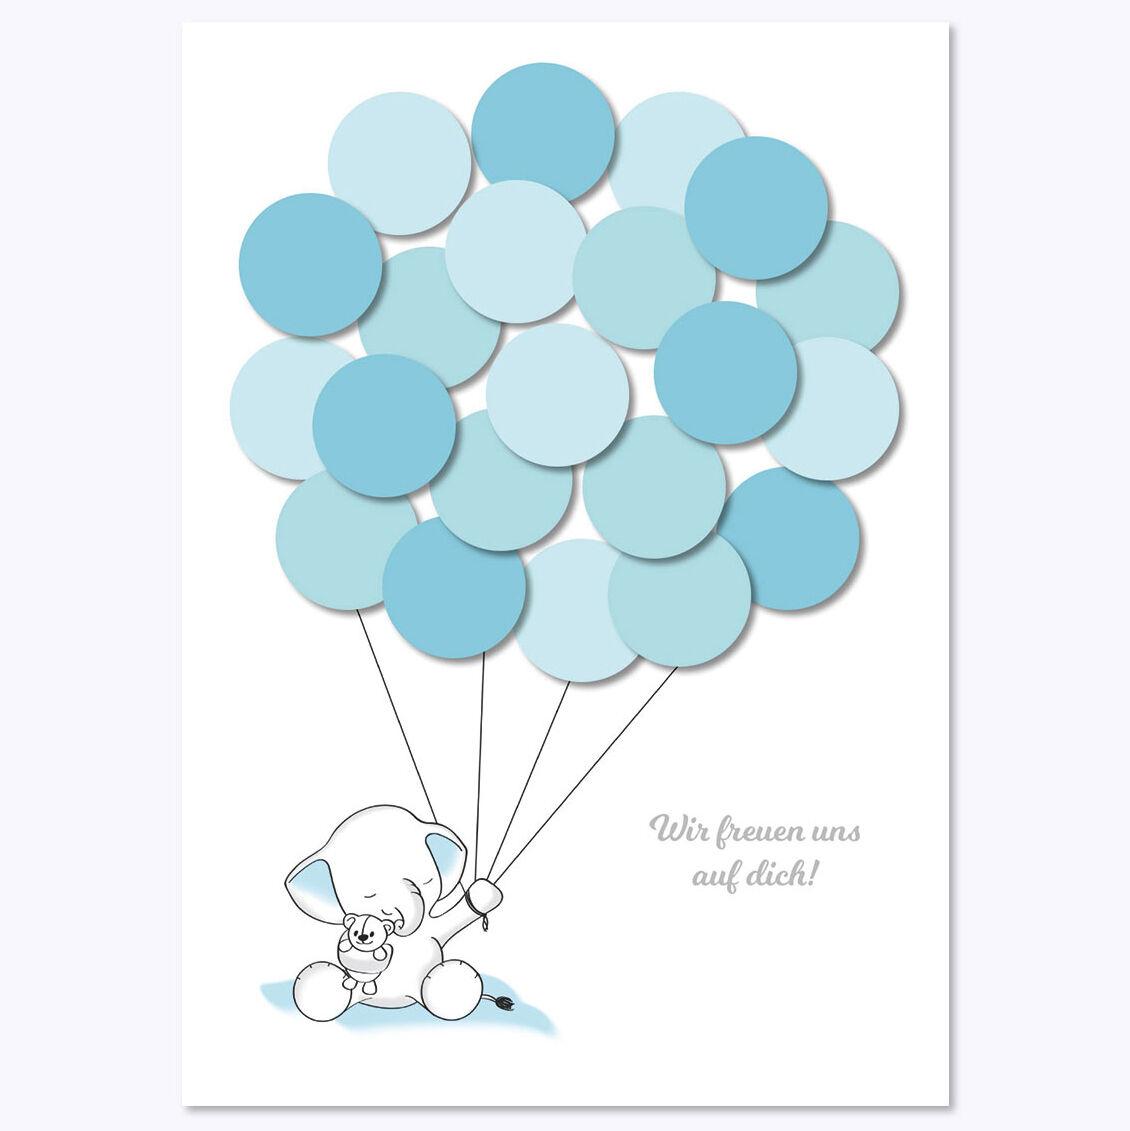 Babyparty, Baby Shower, Deko, Baby Andenken, Elefant, junge, blau von Mia-Felice